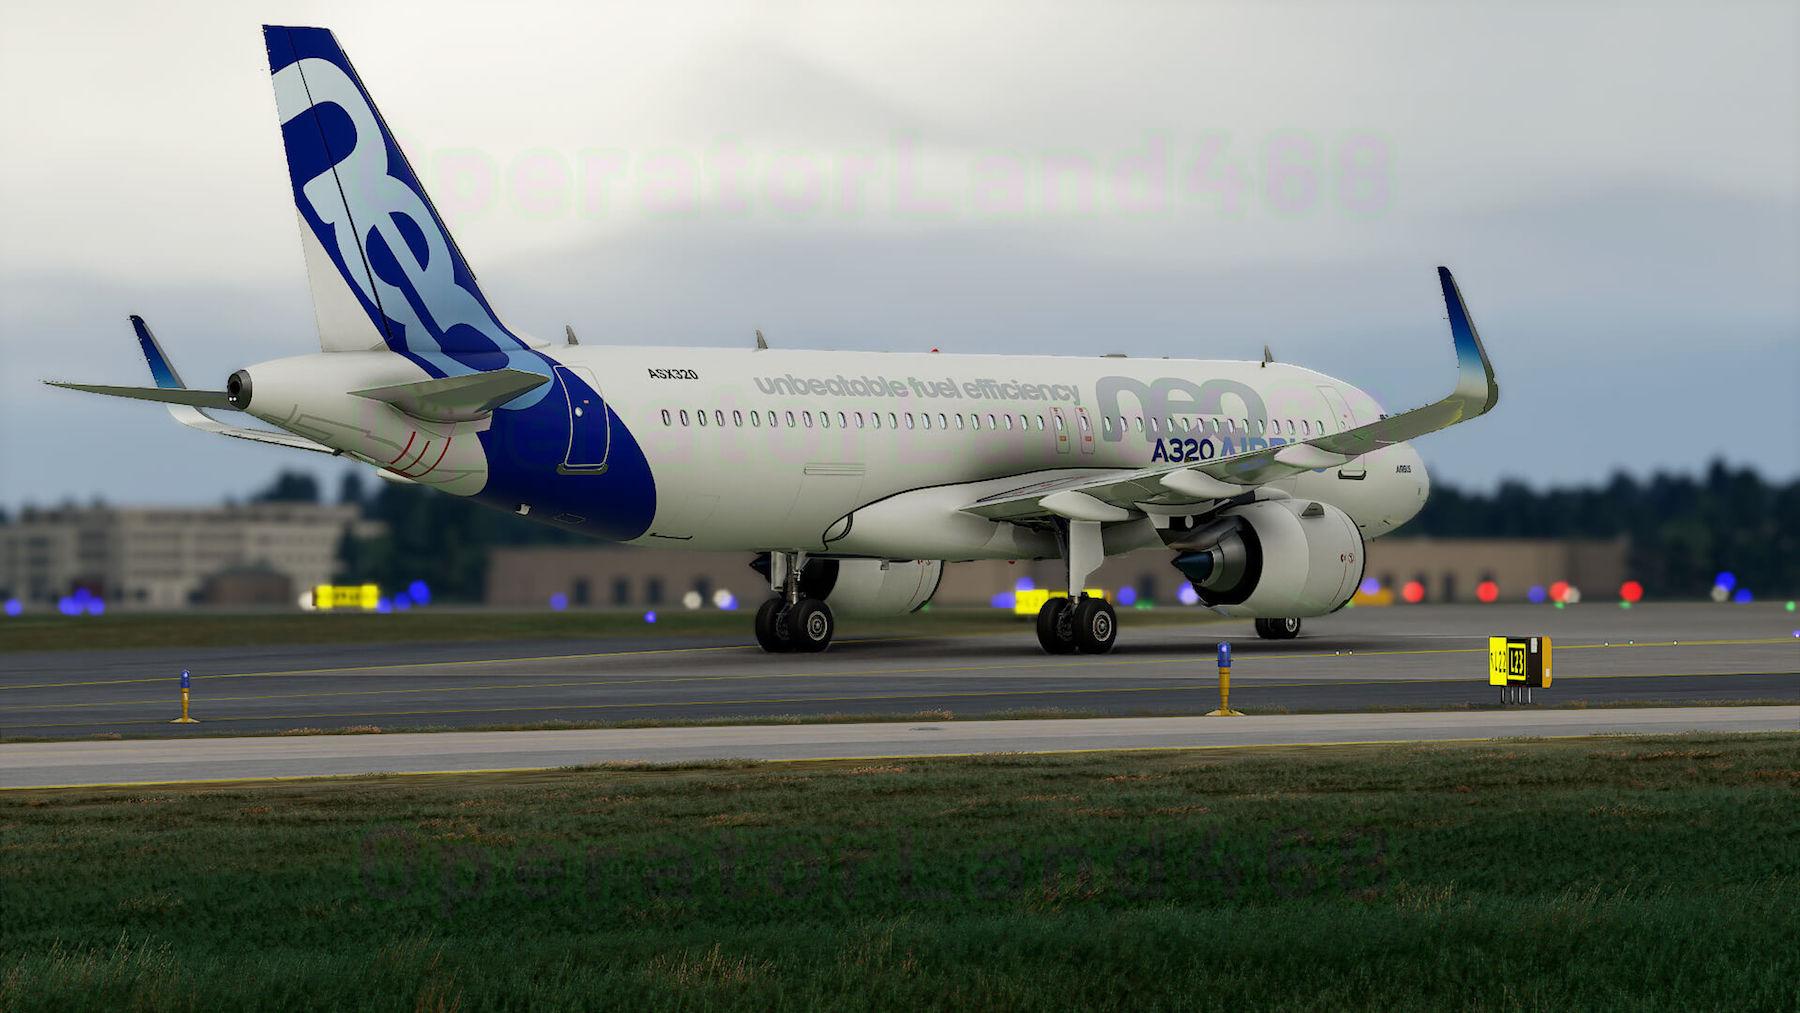 Microsoft Flight Simulator's New Screenshots Look Incredible